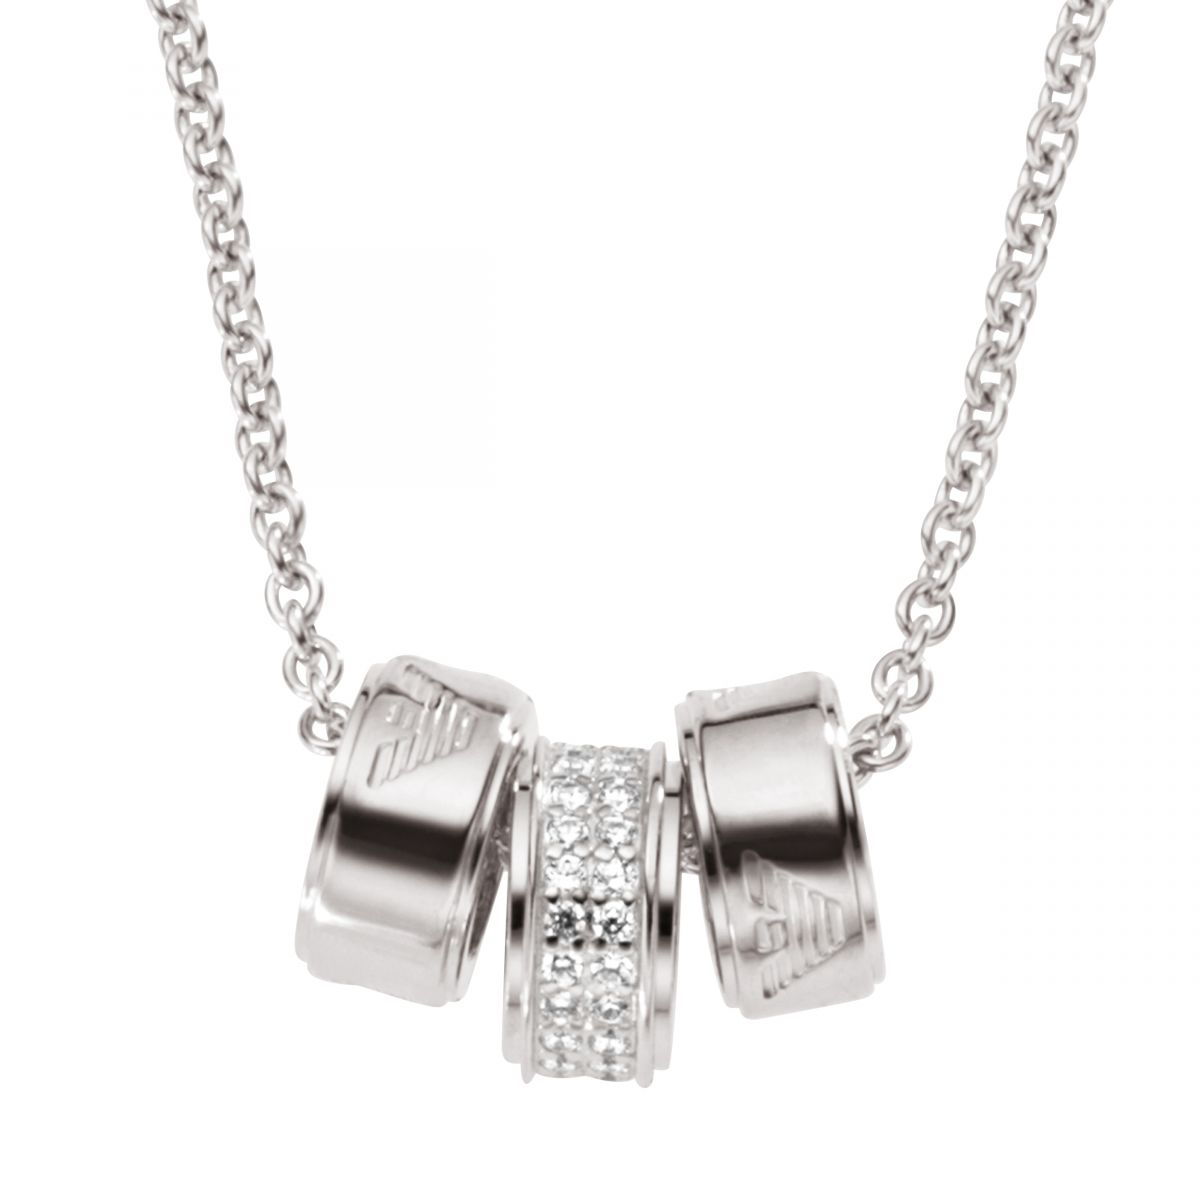 JEWELLERY - Necklaces Emporio Armani EdWXQAK3S